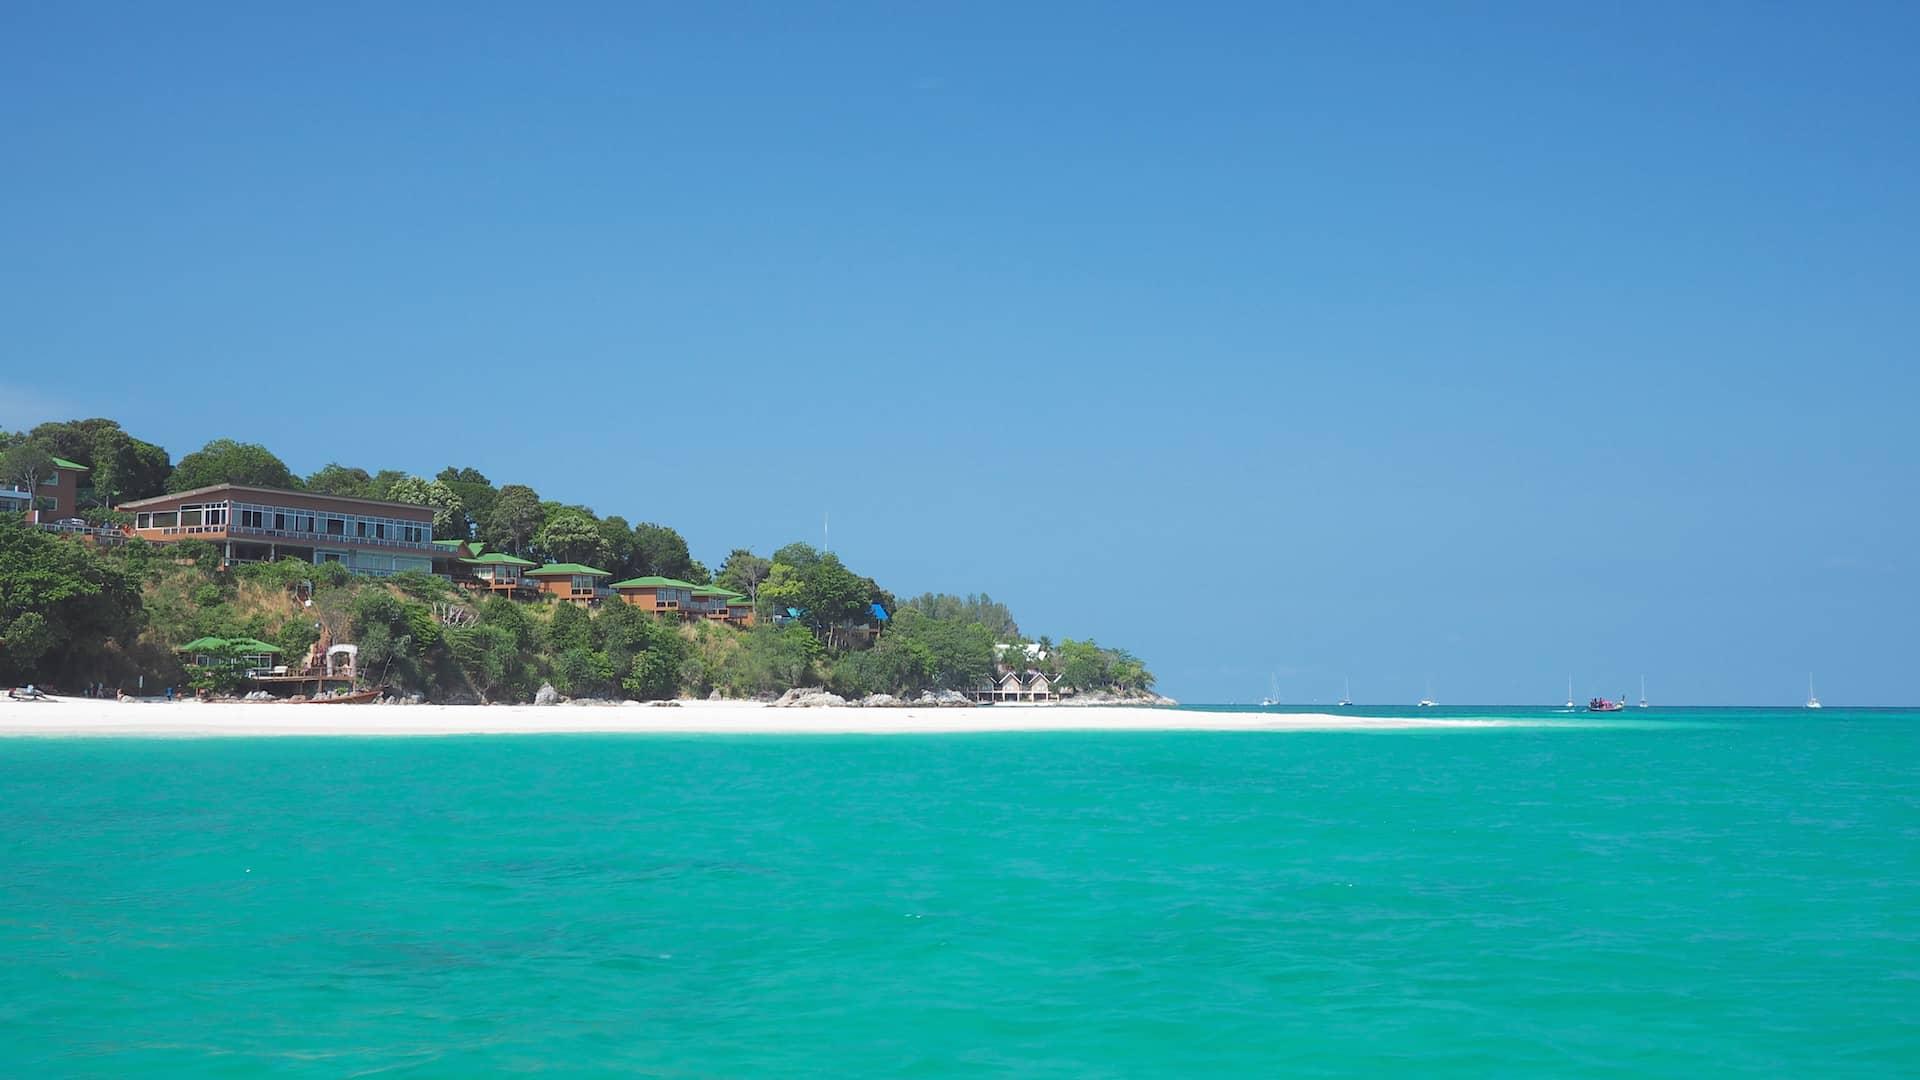 KOH LIPE - STILL AN IDYLLIC ISLAND?